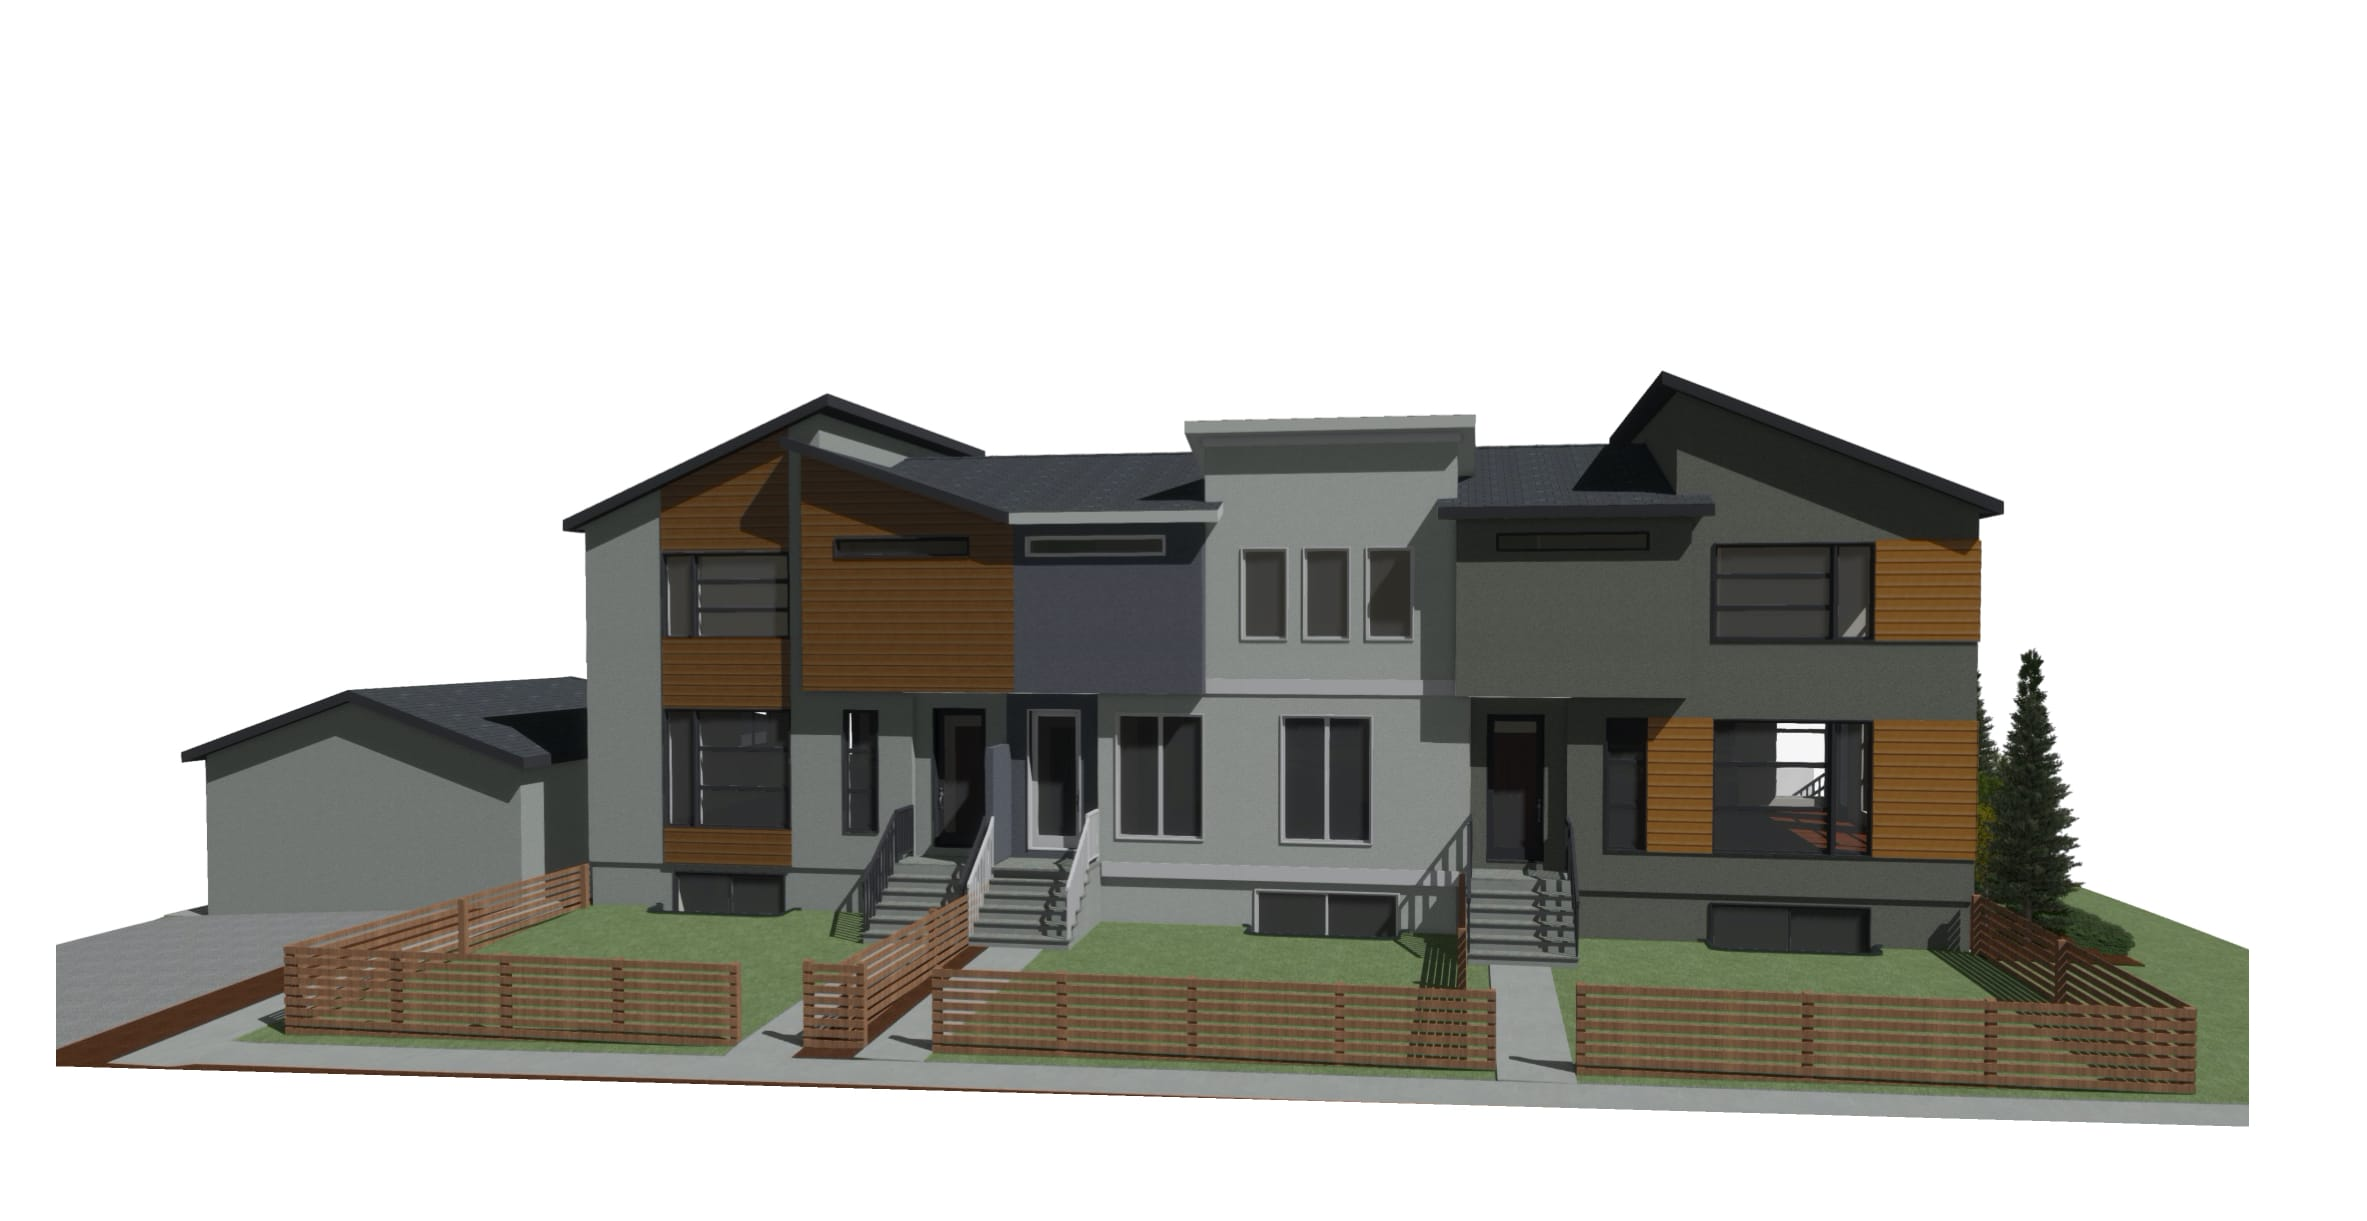 project_details_image